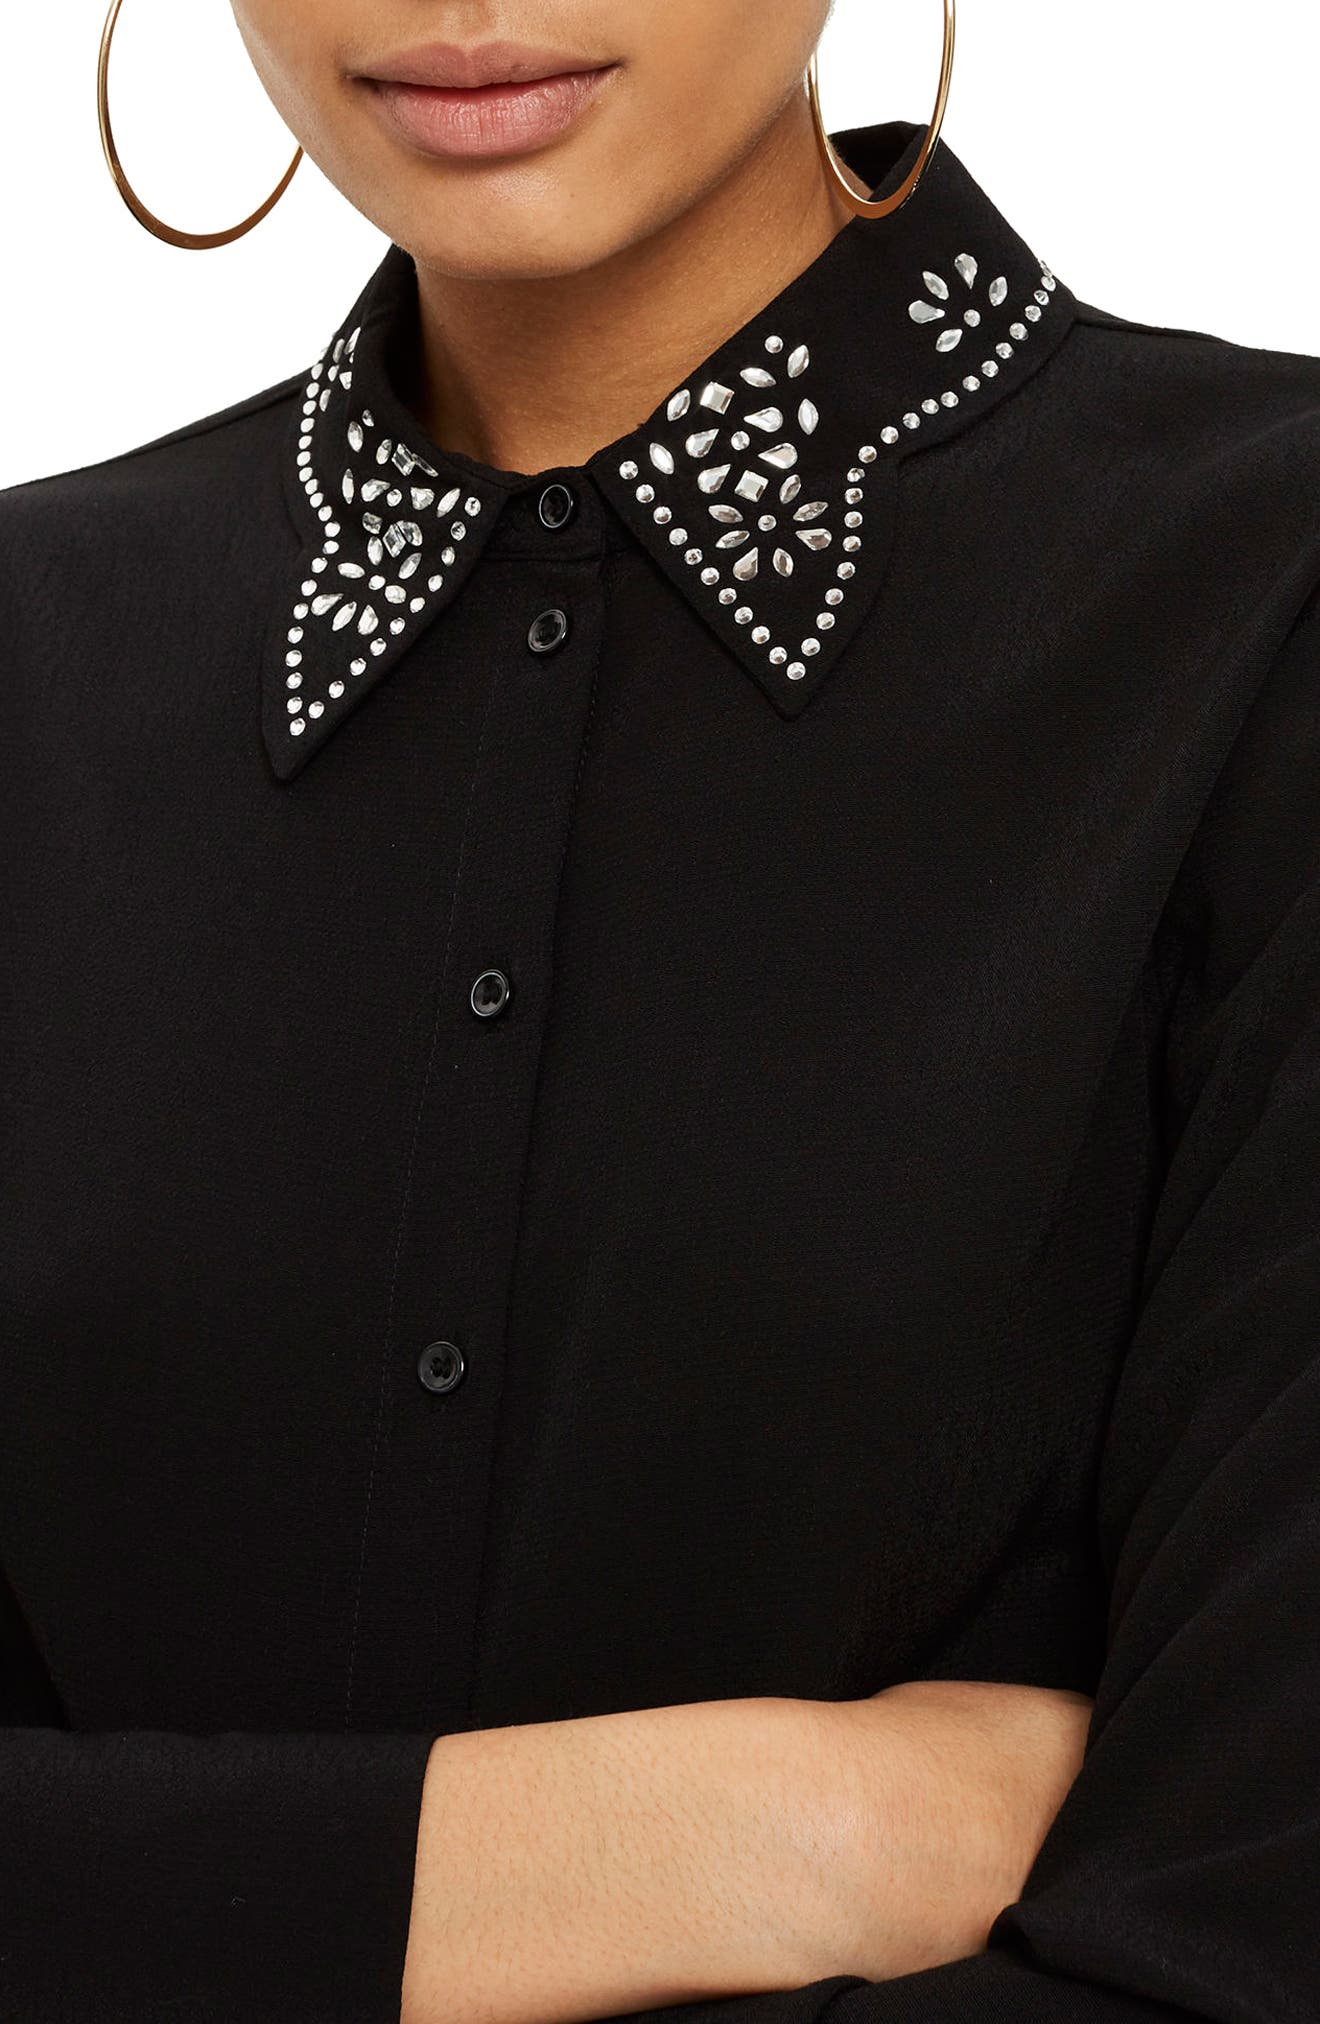 Gem Collar Blouse,                             Alternate thumbnail 3, color,                             Black